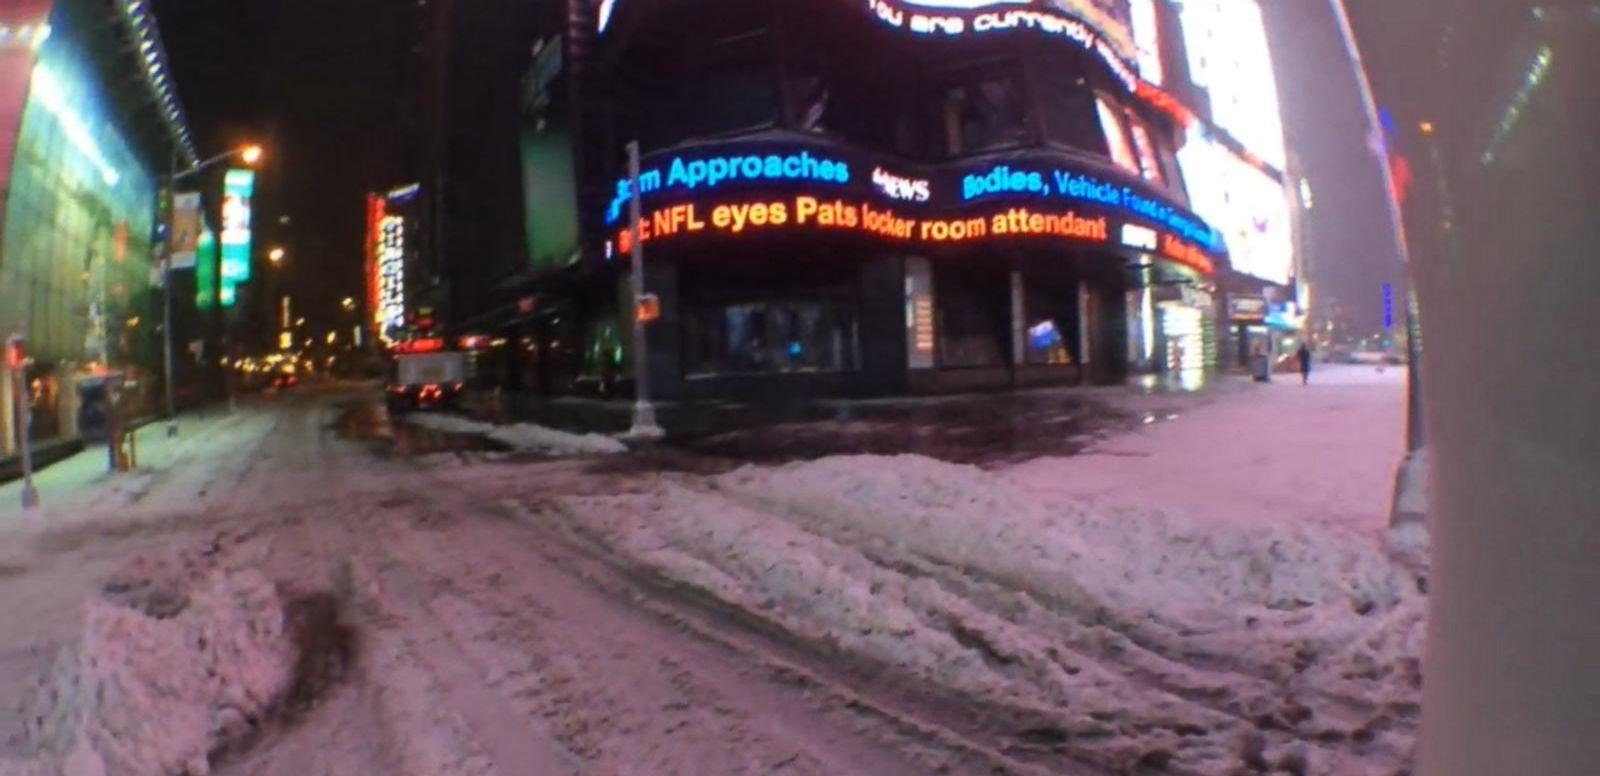 VIDEO: 2015 Blizzard Shuts Down Major Cities in Northeast